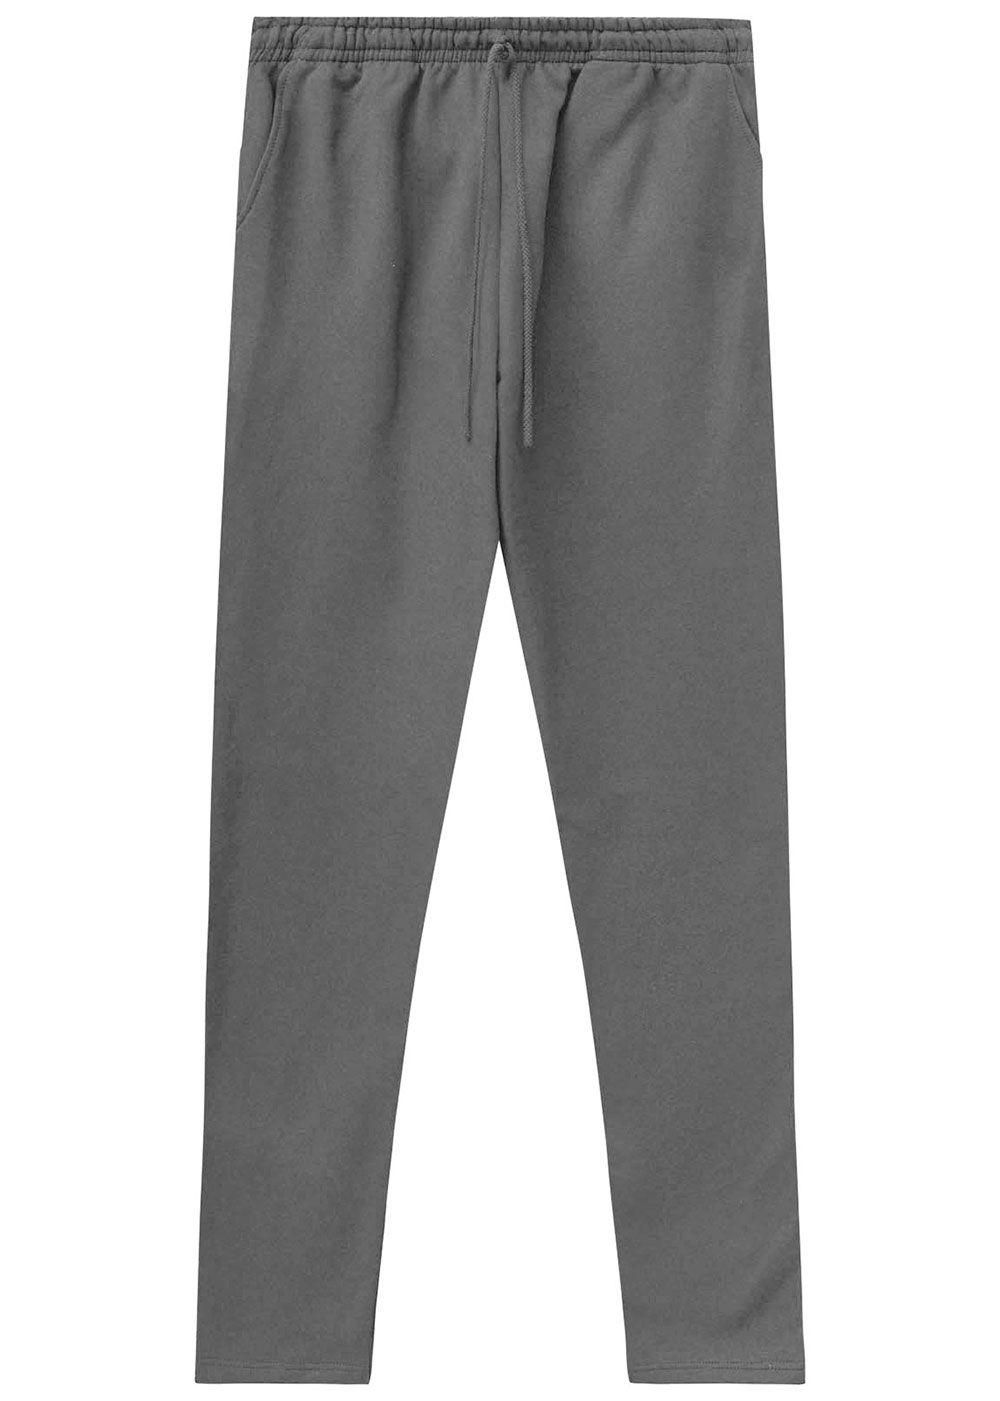 Calça Masculina Adulto Inverno Cinza Escuro Malwee